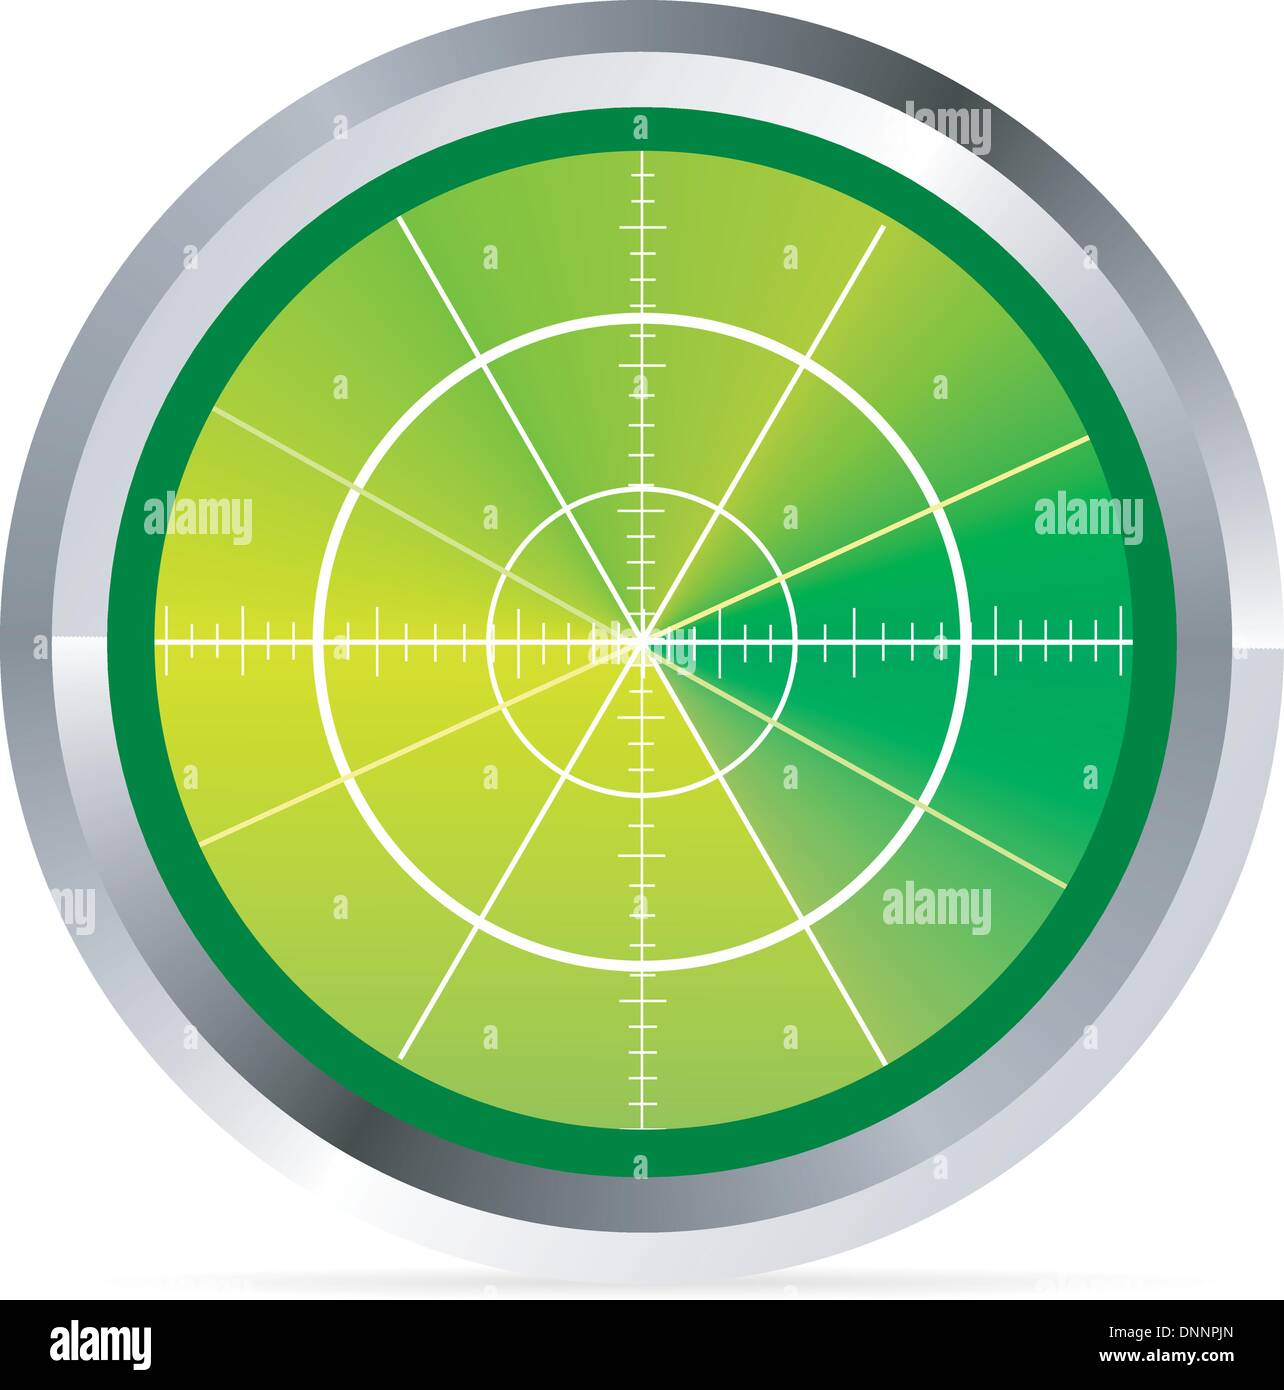 Abbildung von Radar oder Oszilloskop monitor Stockbild